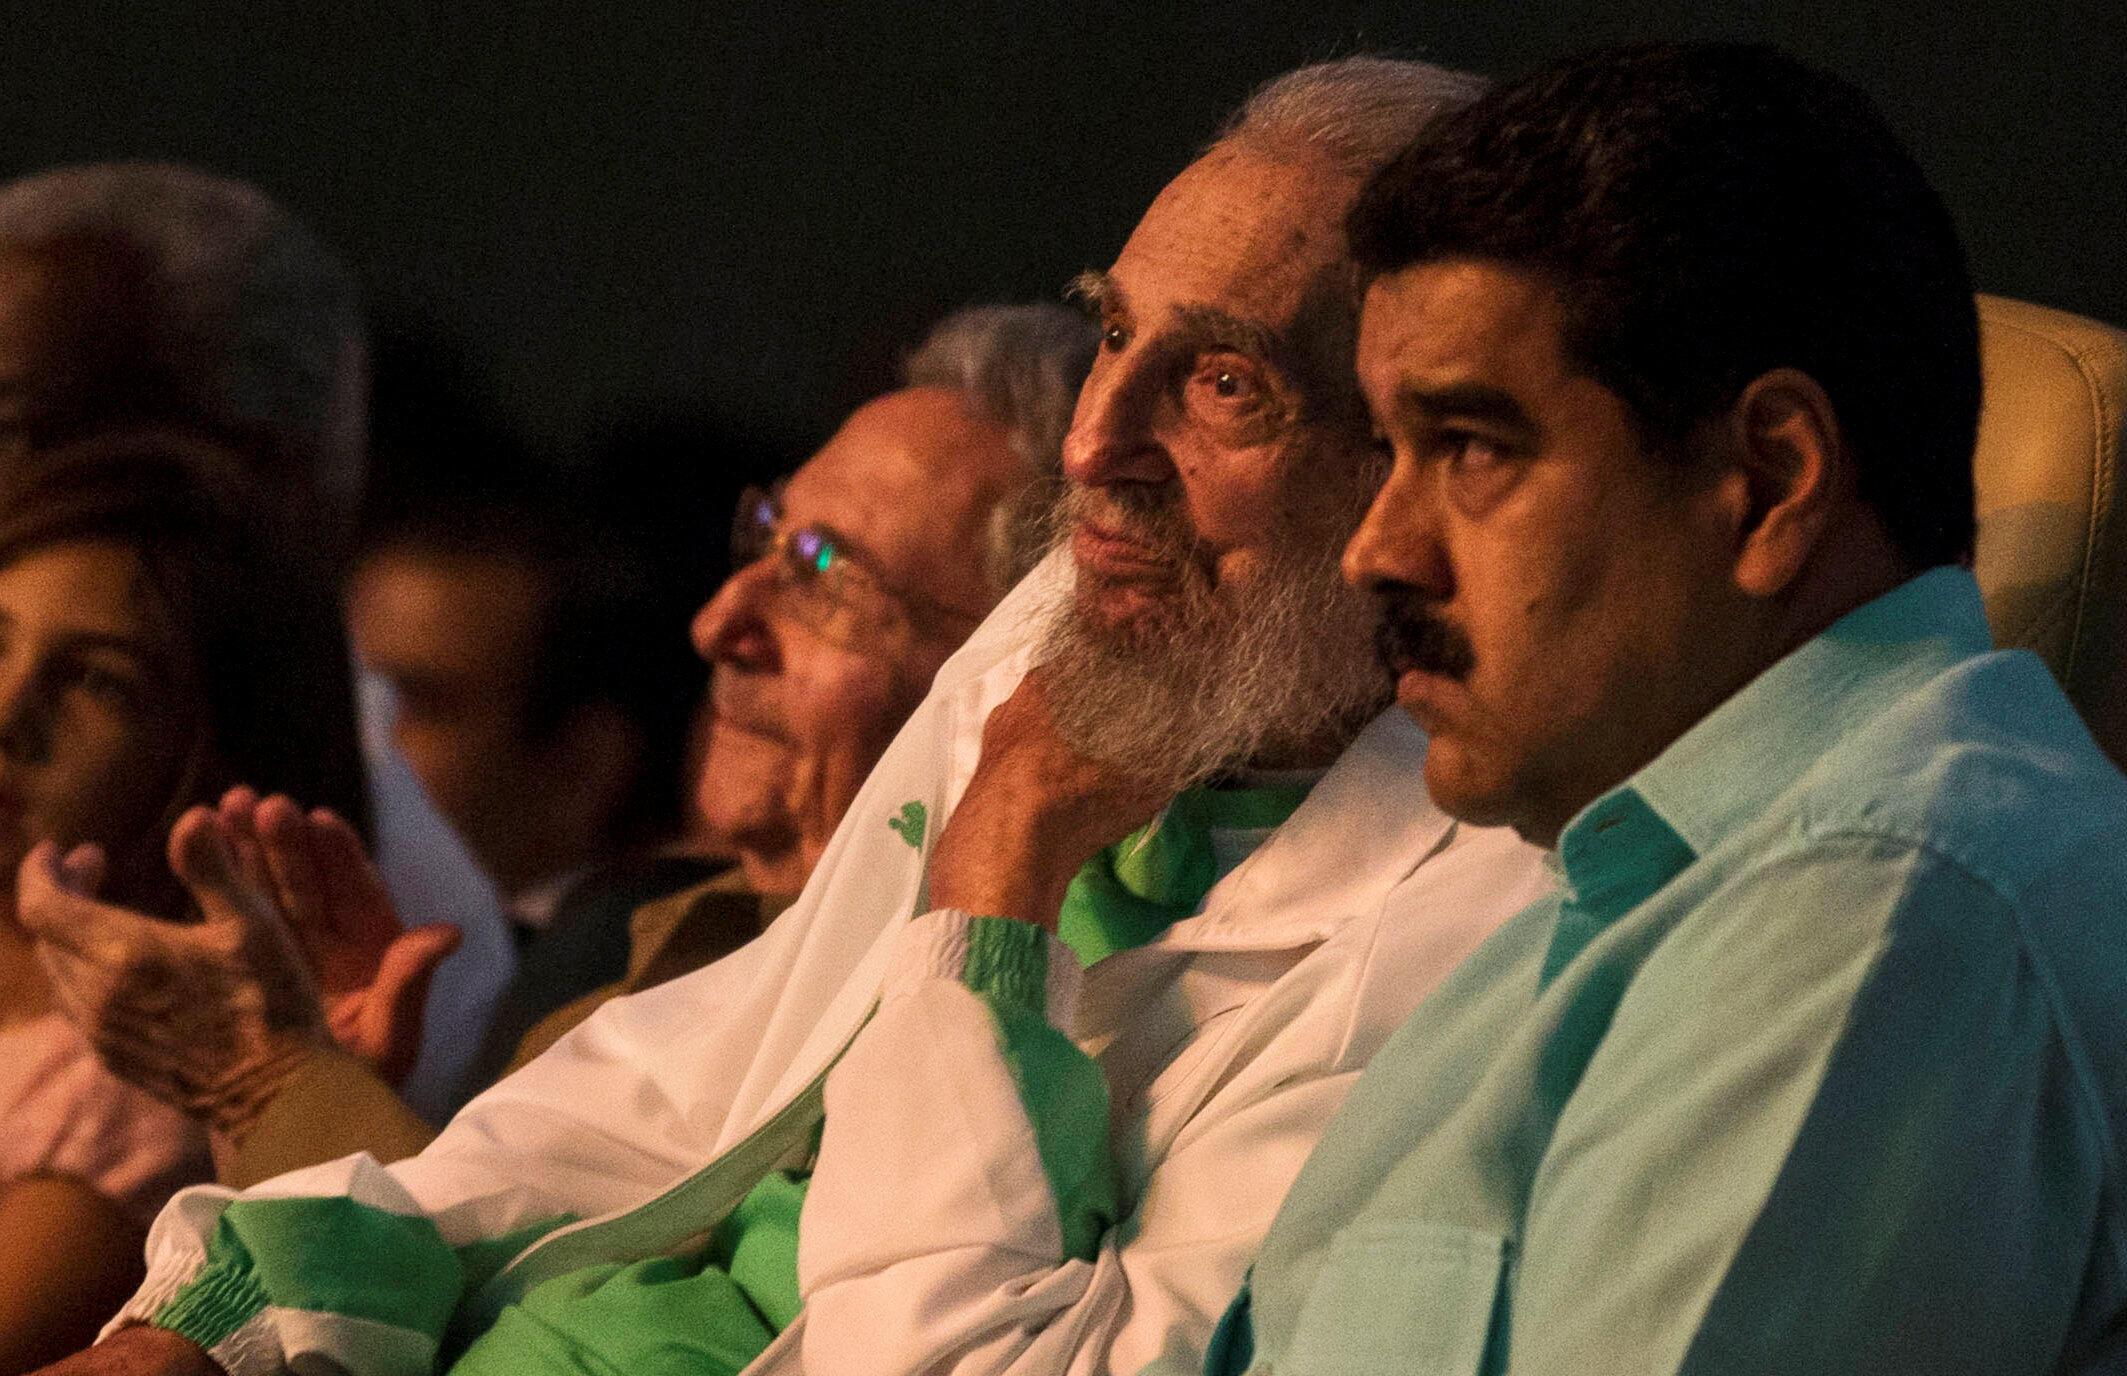 Fidel Castro (T) và tổng thống Venezuela, Nicolas Maduro, ngày 13/08/2016 nhân lễ mừng 90 tuổi của Fidel Castro.